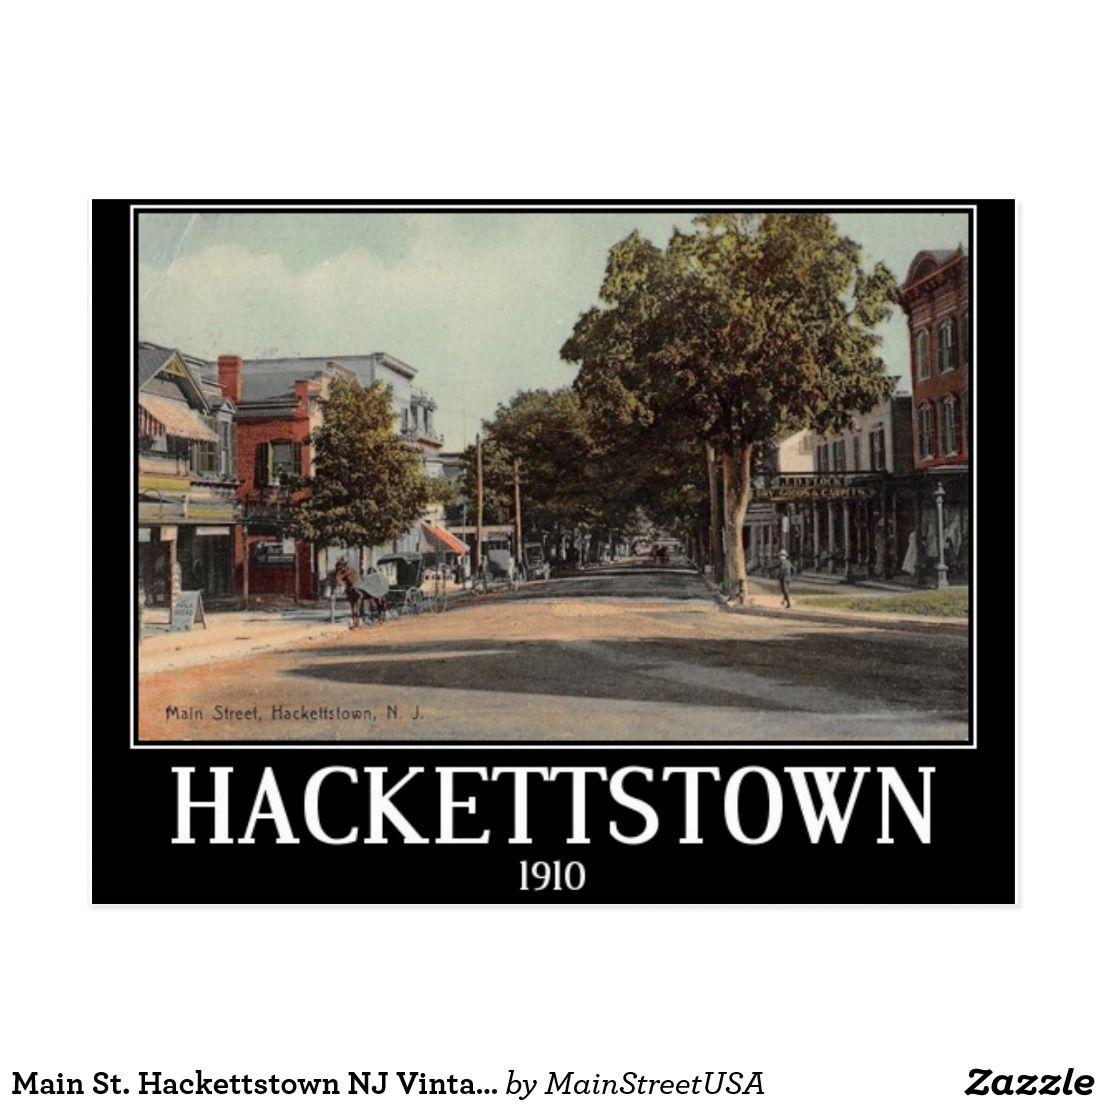 Main St Hackettstown Nj Vintage Postcard Zazzle Com Hackettstown Vintage Postcard Postcard